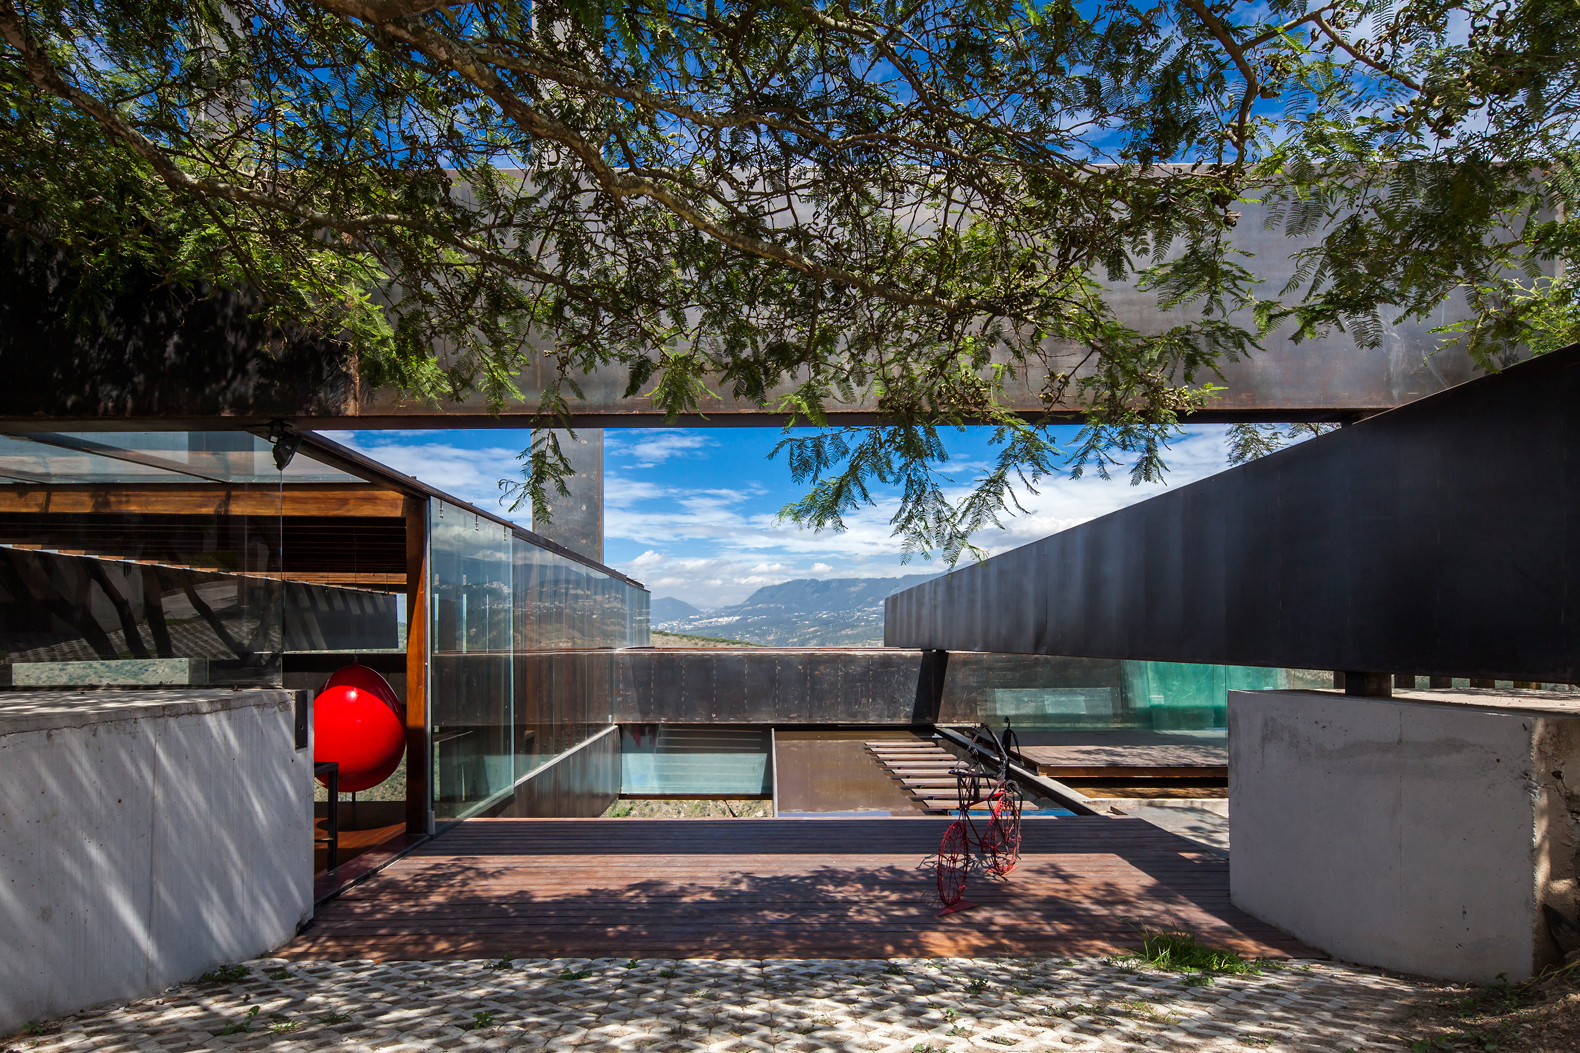 Casa Los Algarrobos / José María Sáez + Daniel Moreno Flores, © Sebastian Crespo